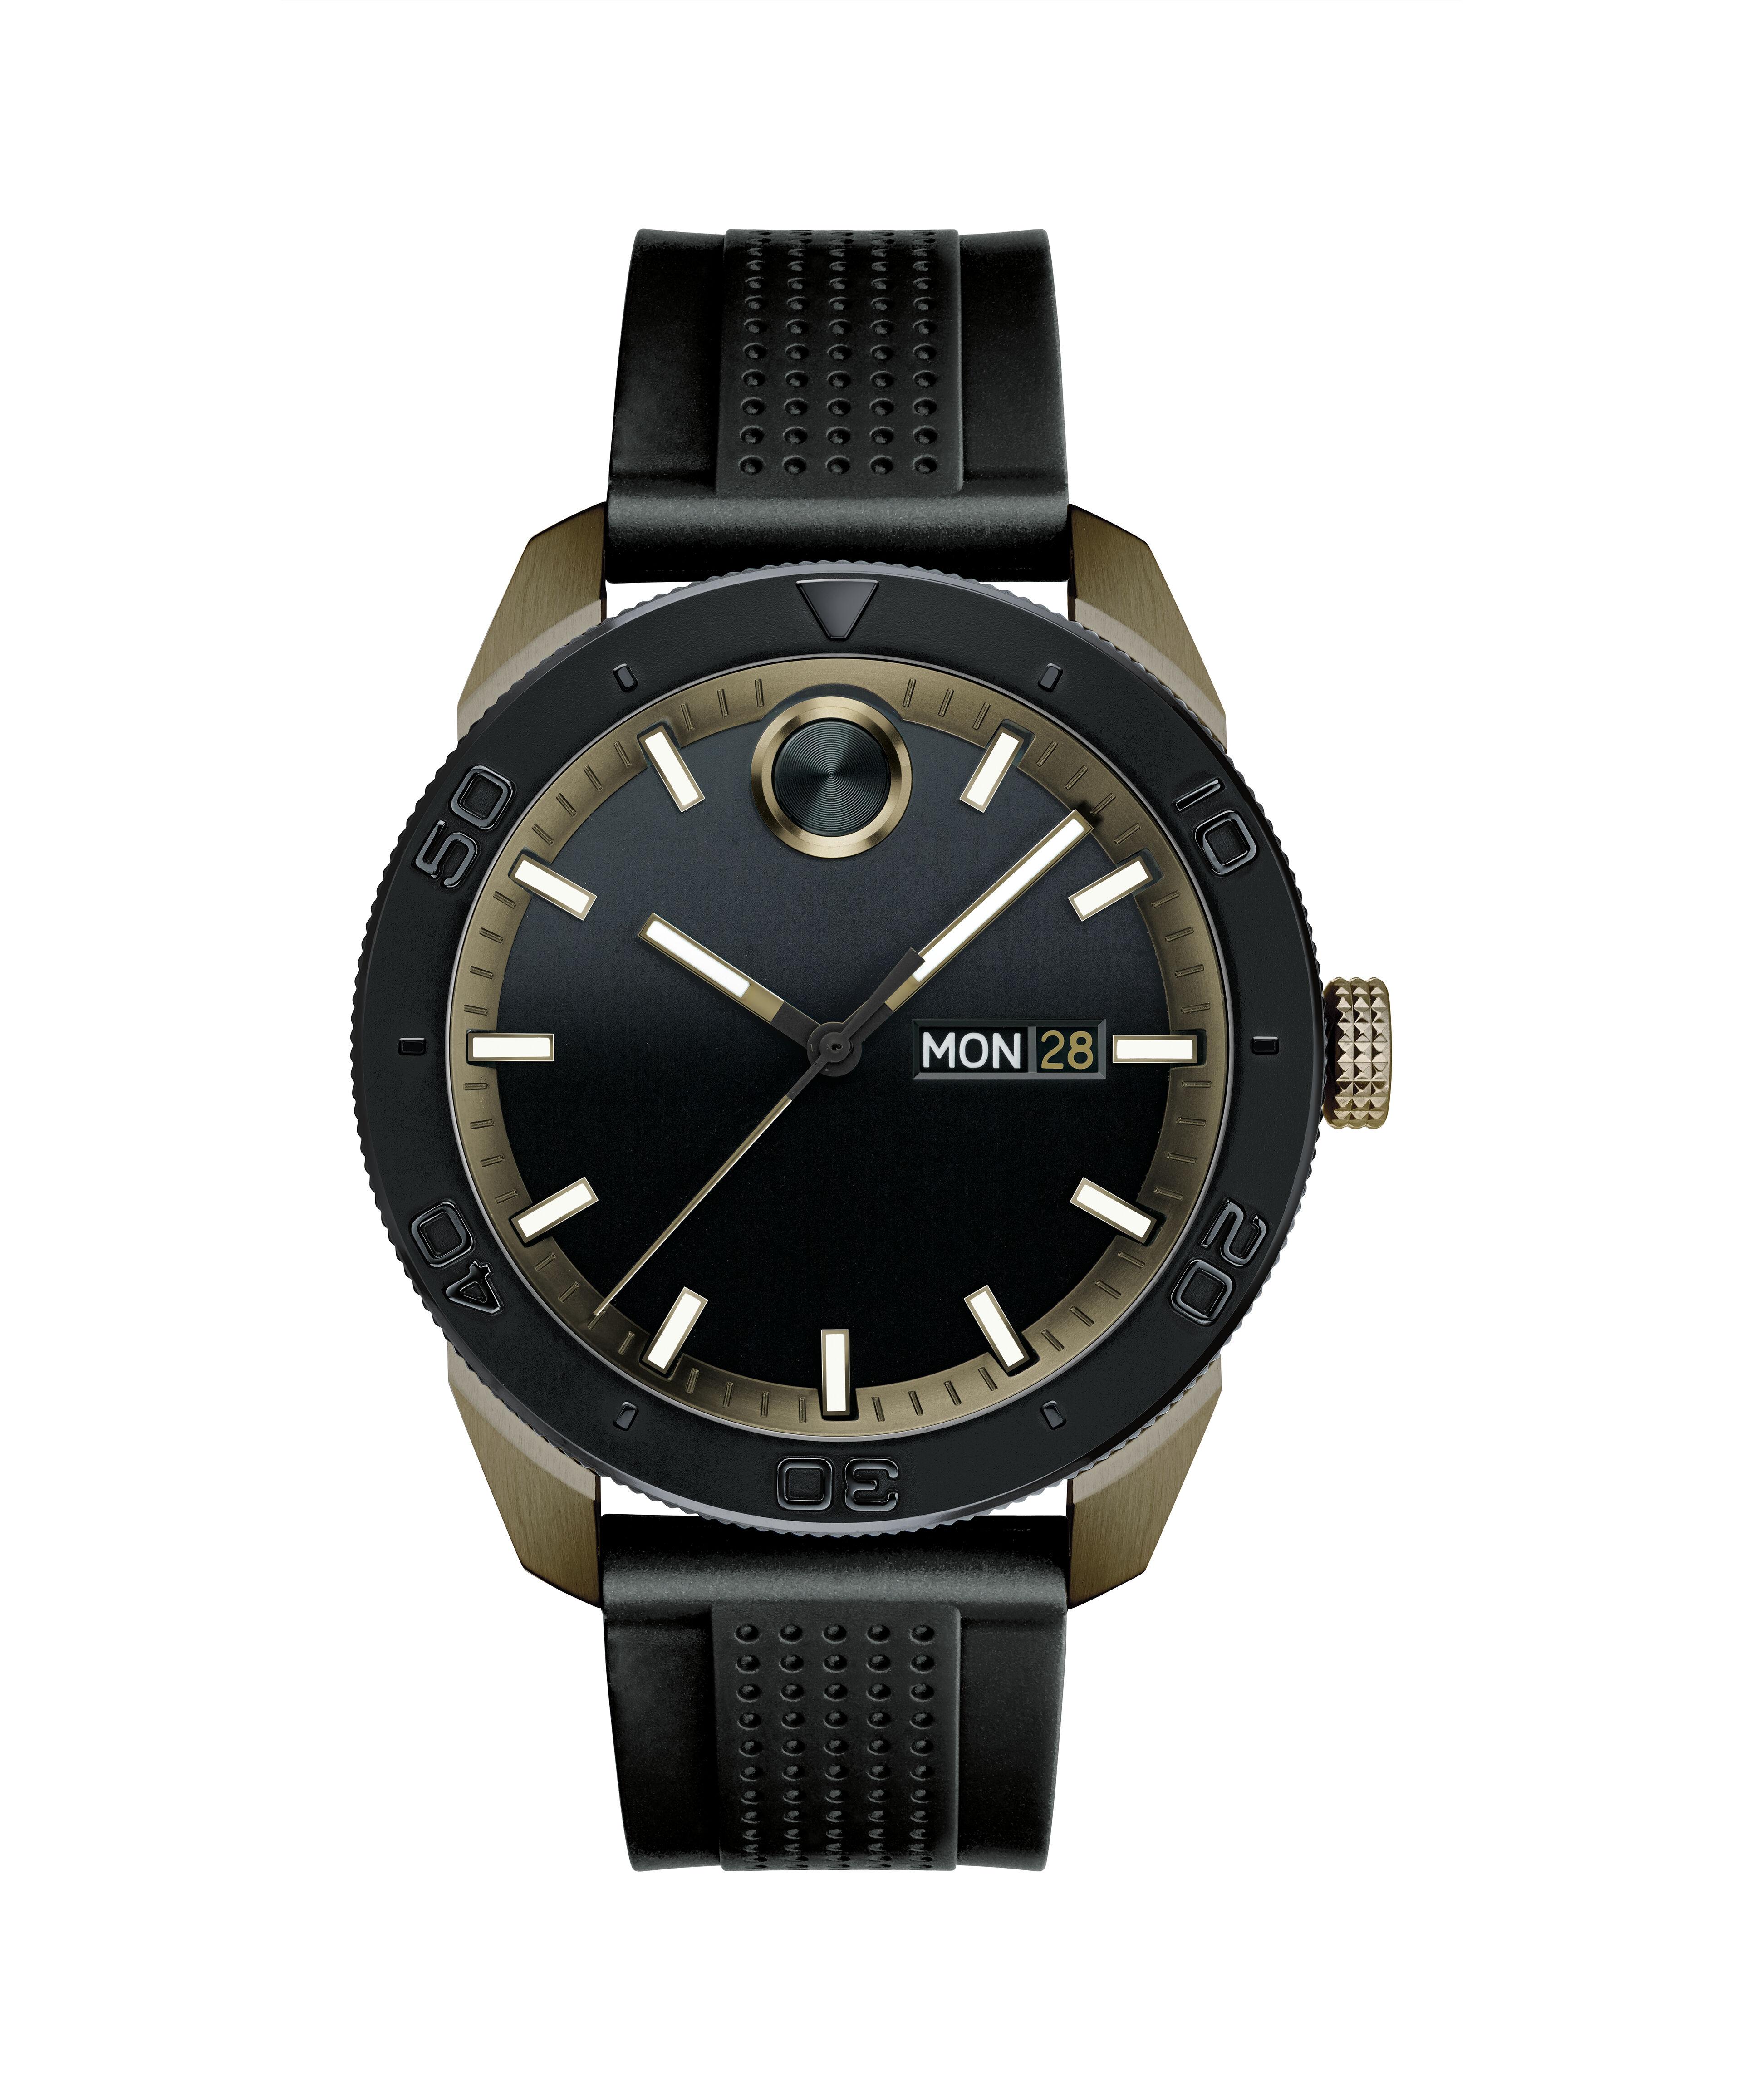 Replica Division Watch